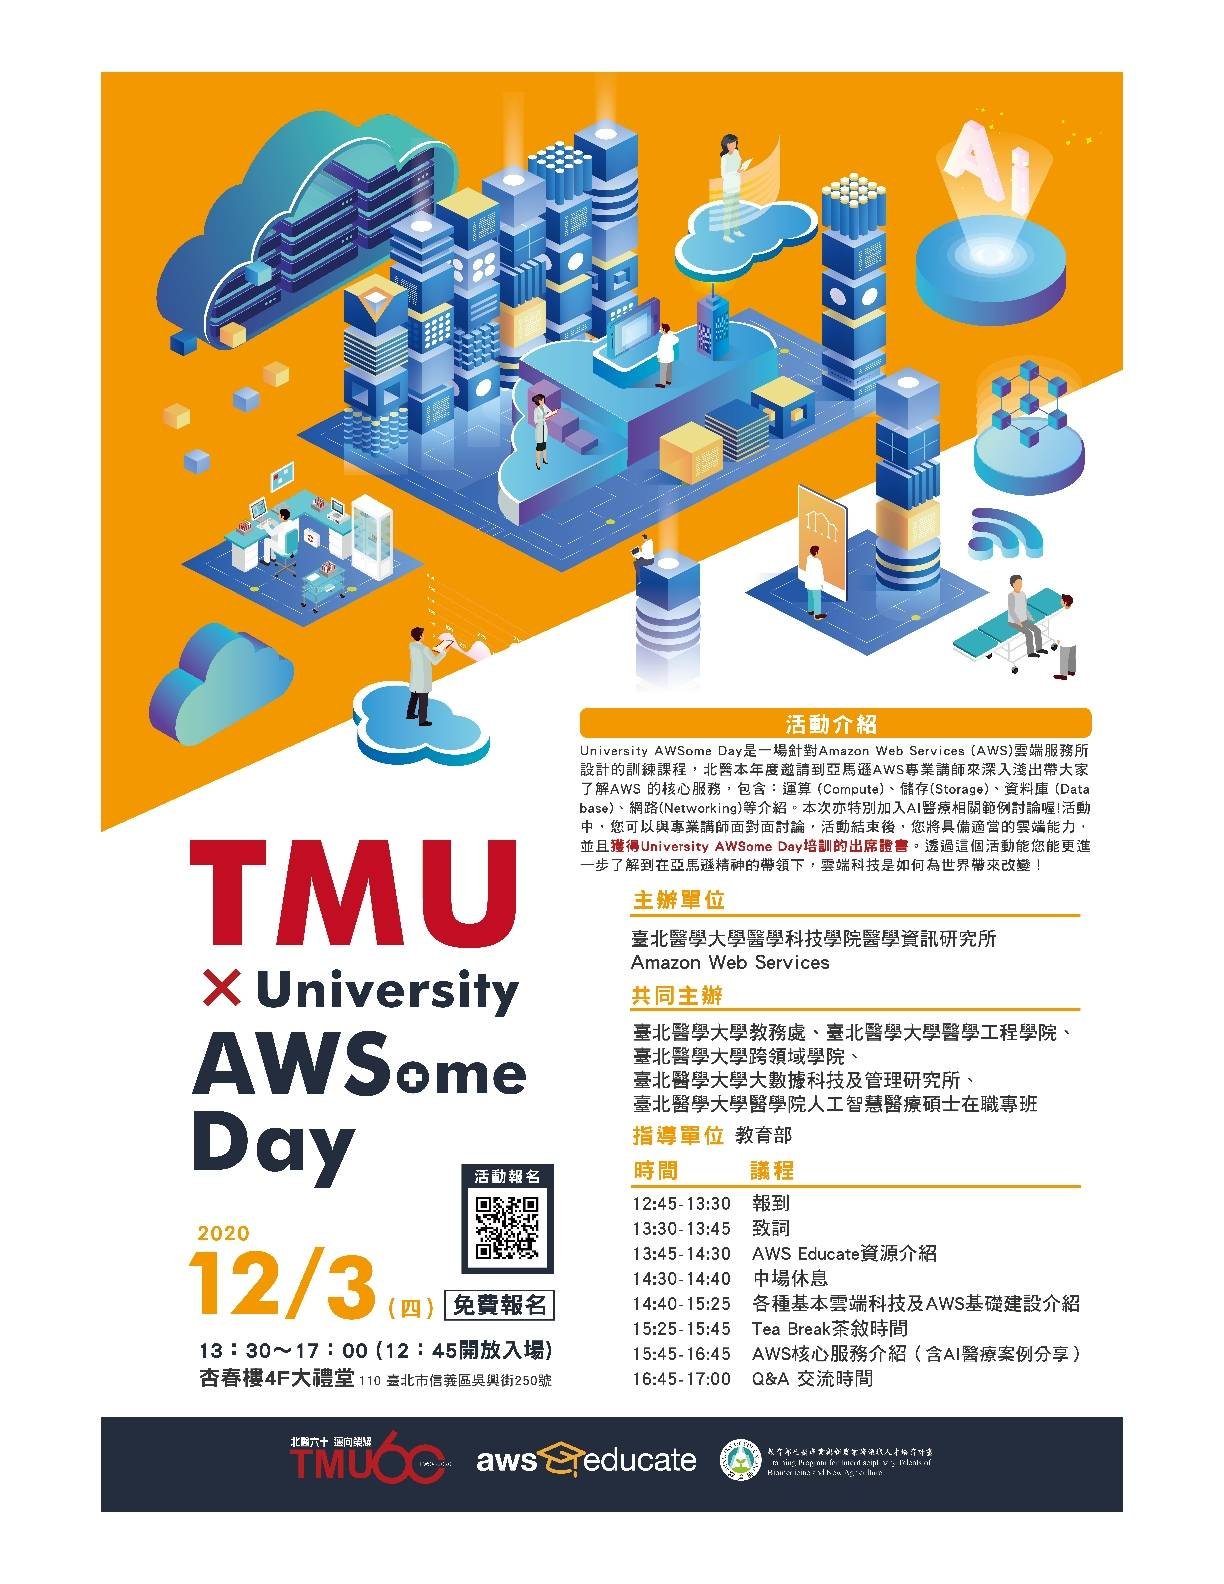 University AWSome Day是一場針對Amazon Web Services (AWS)雲端服務所設計的訓練課程,北醫本年度邀請到亞馬遜AWS專業講師來深入淺出帶大家了解AWS 的核心服務,包含:運算 (Compute)、儲存(Storage)、資料庫 (Database)、網路(Networking)等介紹。本次亦特別加入AI醫療相關範例討論喔!